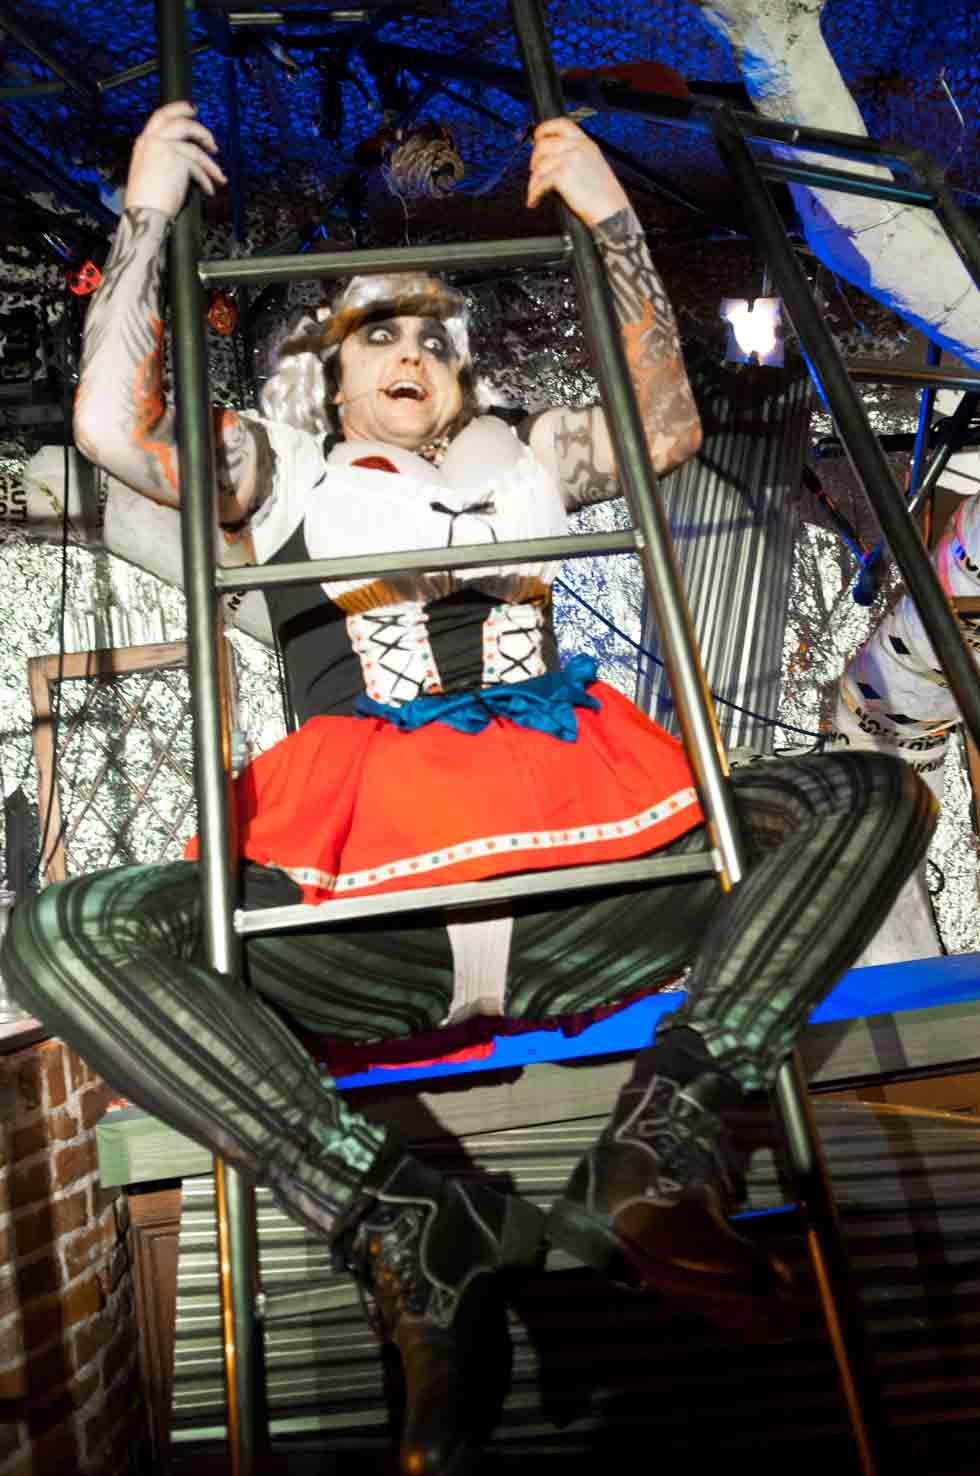 zum-schneider-nyc-2012-karneval-apocalyptika-3731.jpg